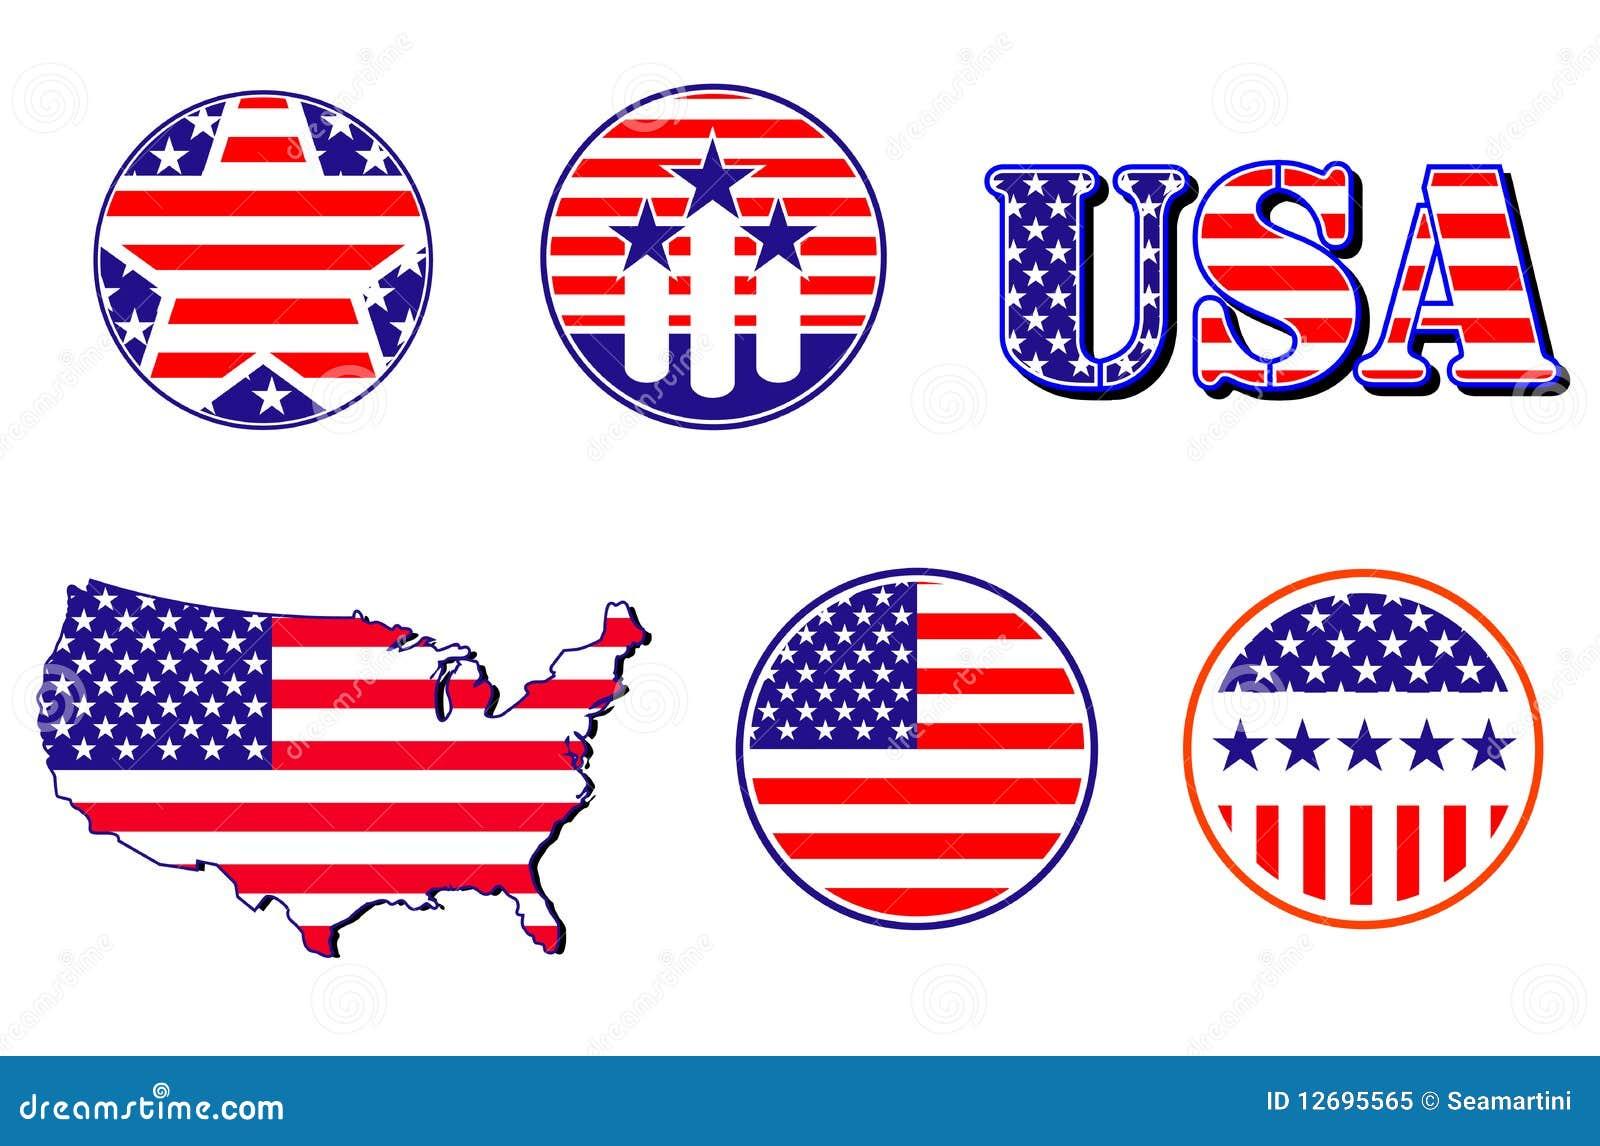 American Patriotic Symbols Stock Vector Illustration Of Justice